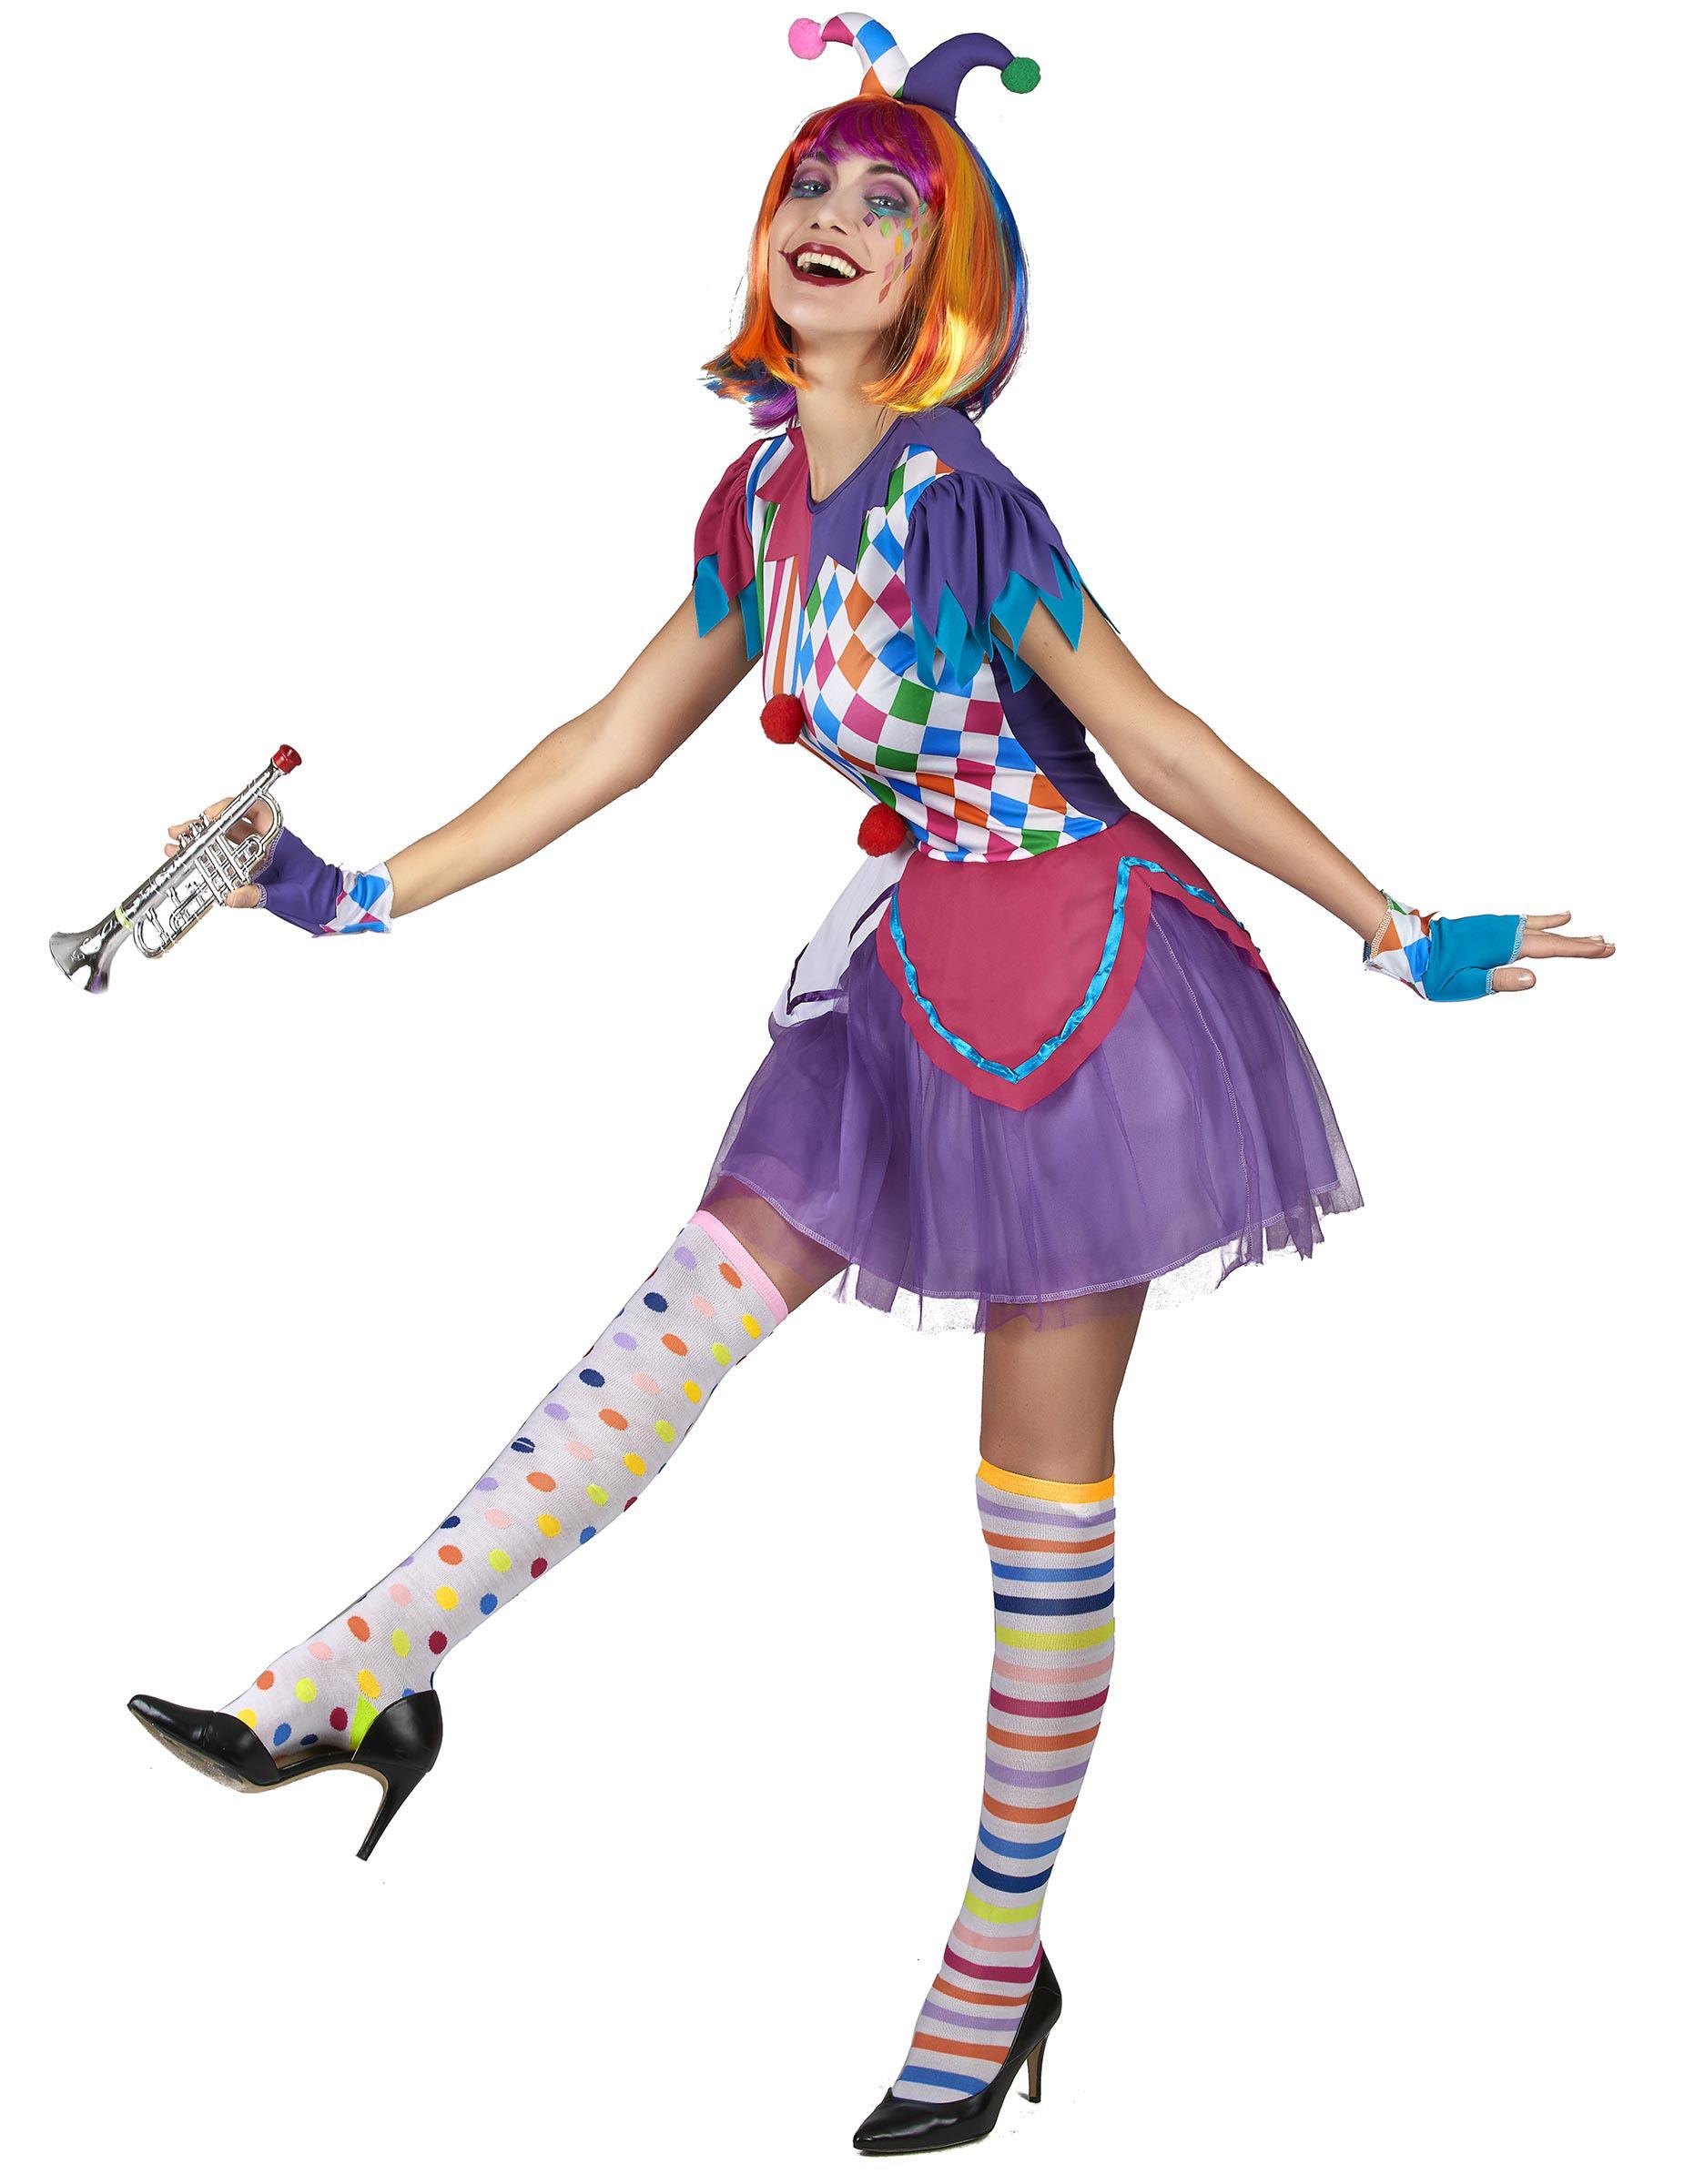 Abito Gonna Lunga Donna Arlecchino Carnevale N8XZOwPn0k